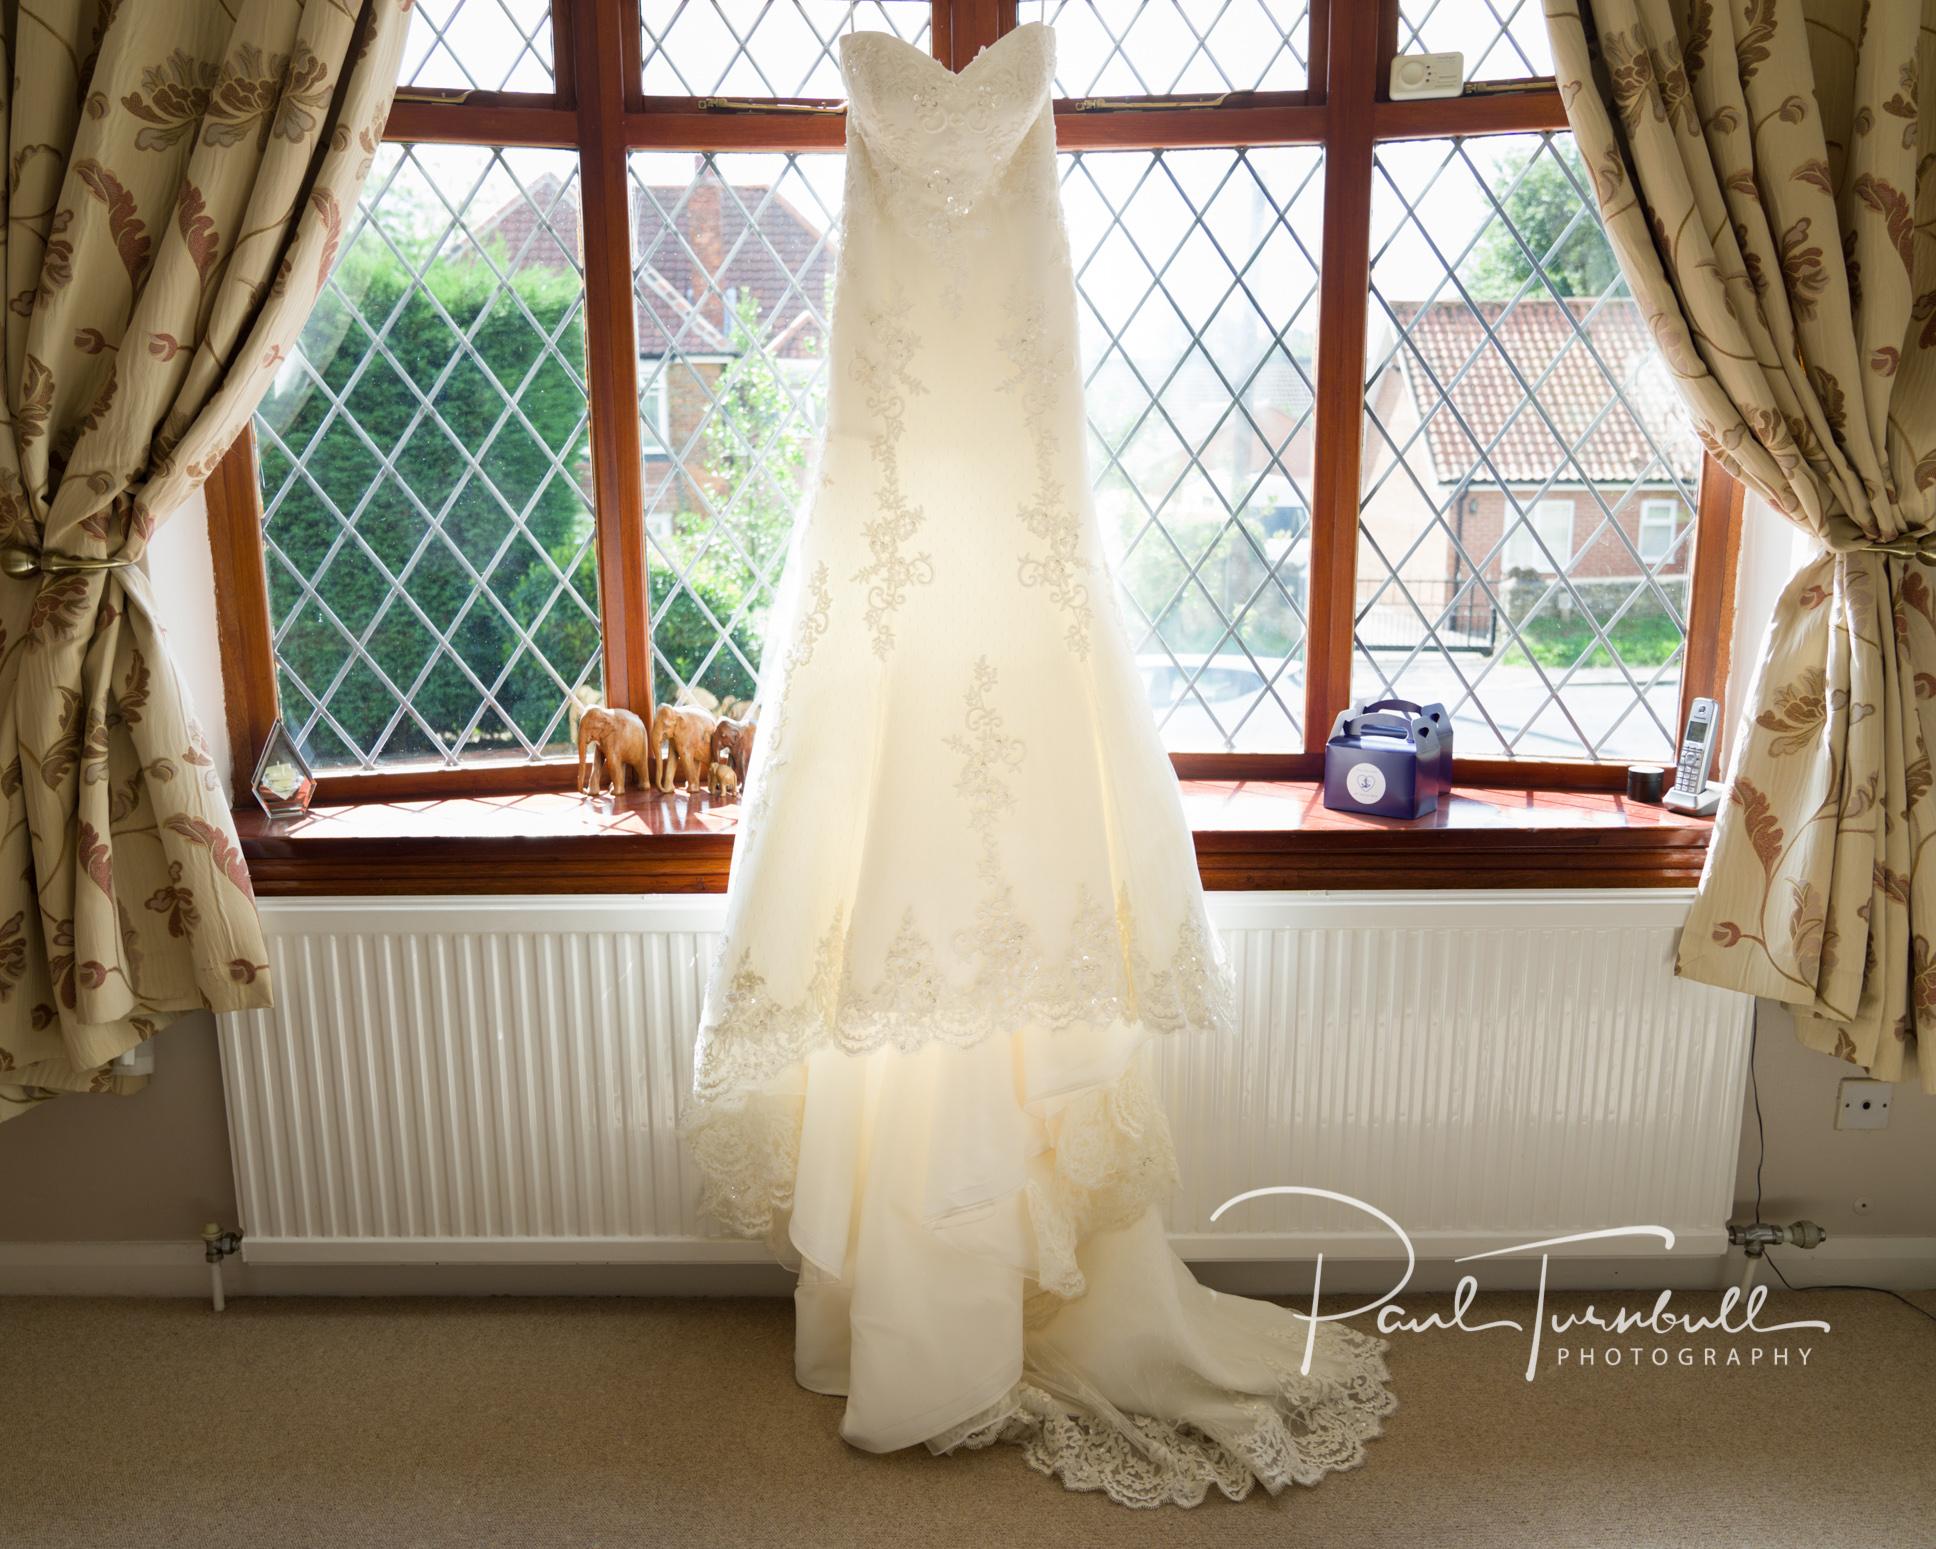 wedding-photographer-south-dalton-walkington-yorkshire-emma-james-011.jpg